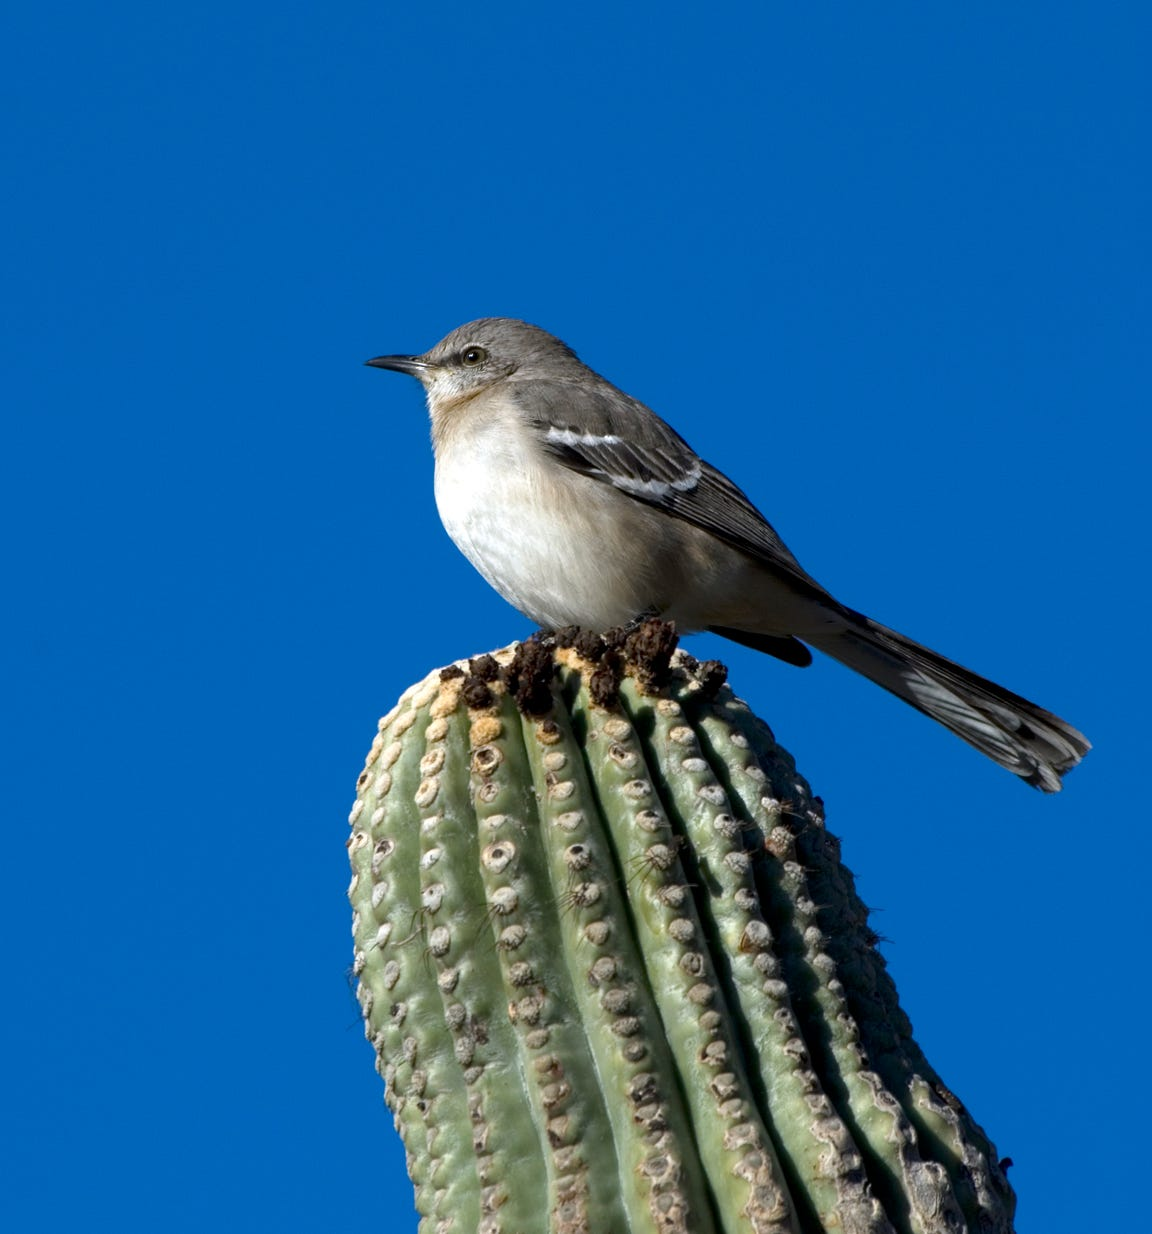 Unlike the loggerhead shrike, a mockingbird lacks a black facial mask.